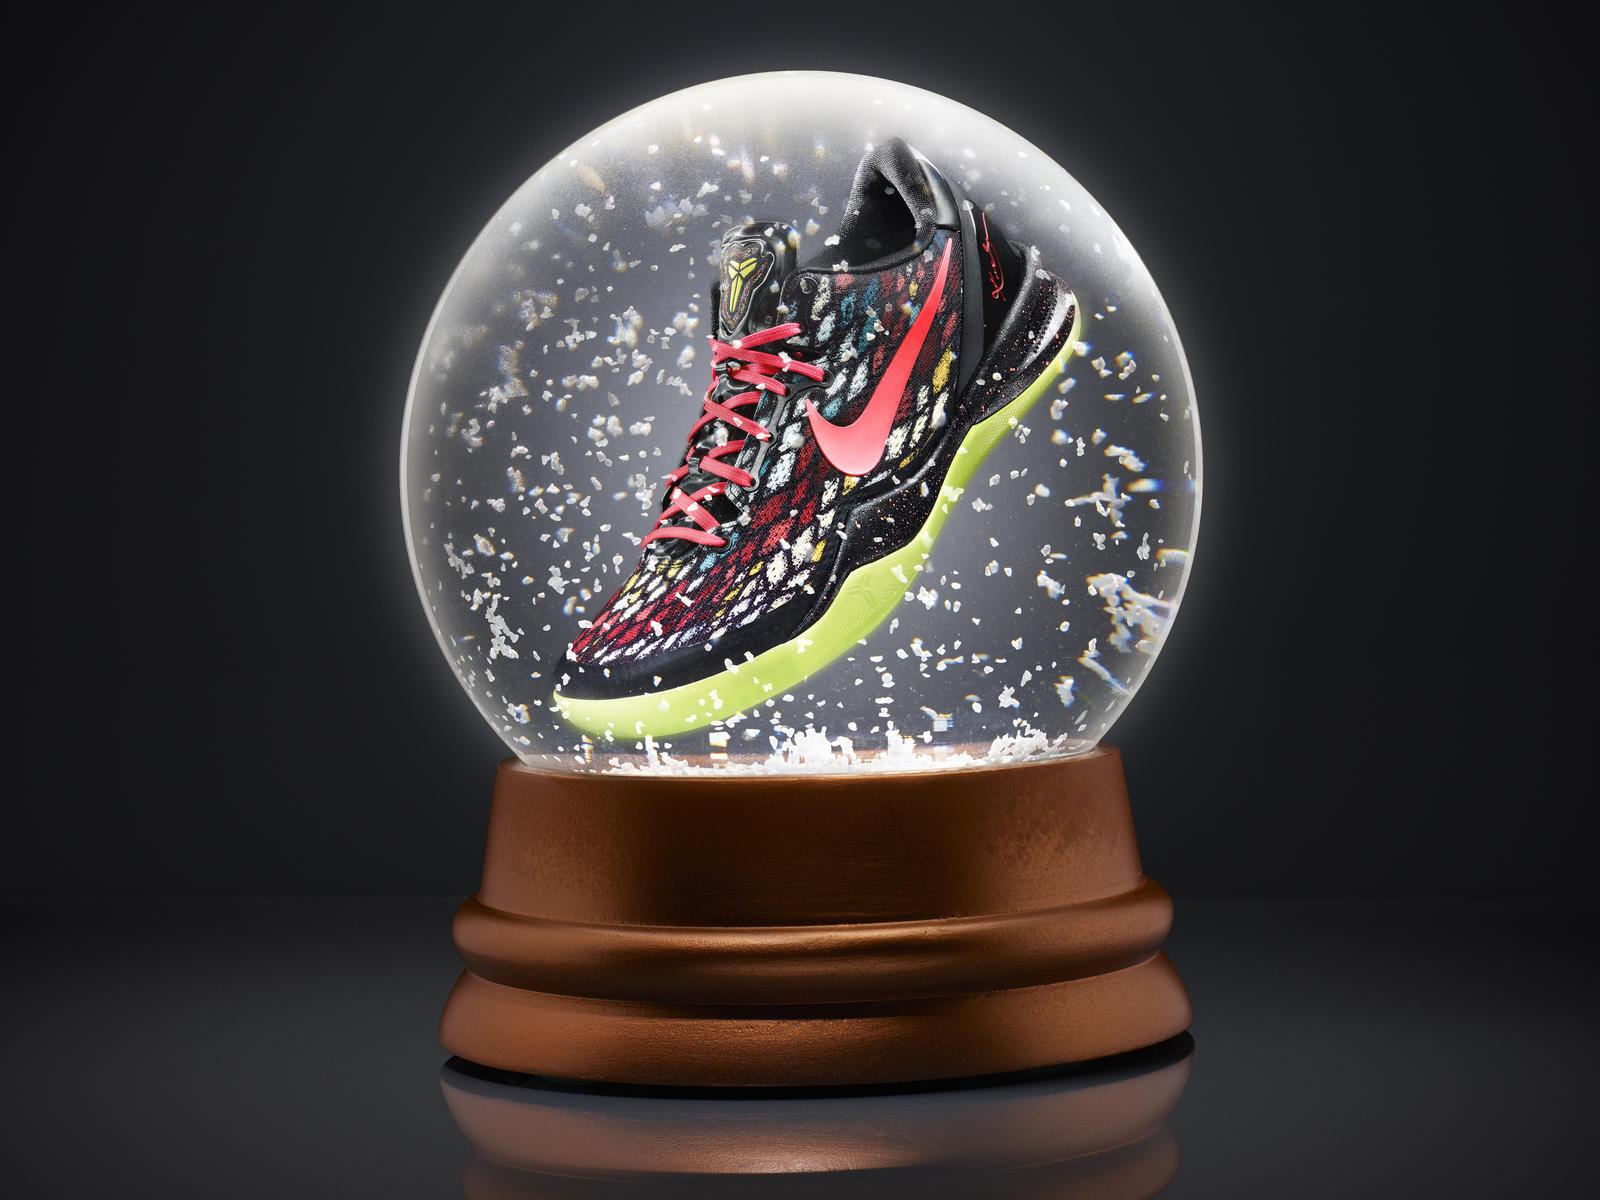 Kobe Nike Basketball Shoes